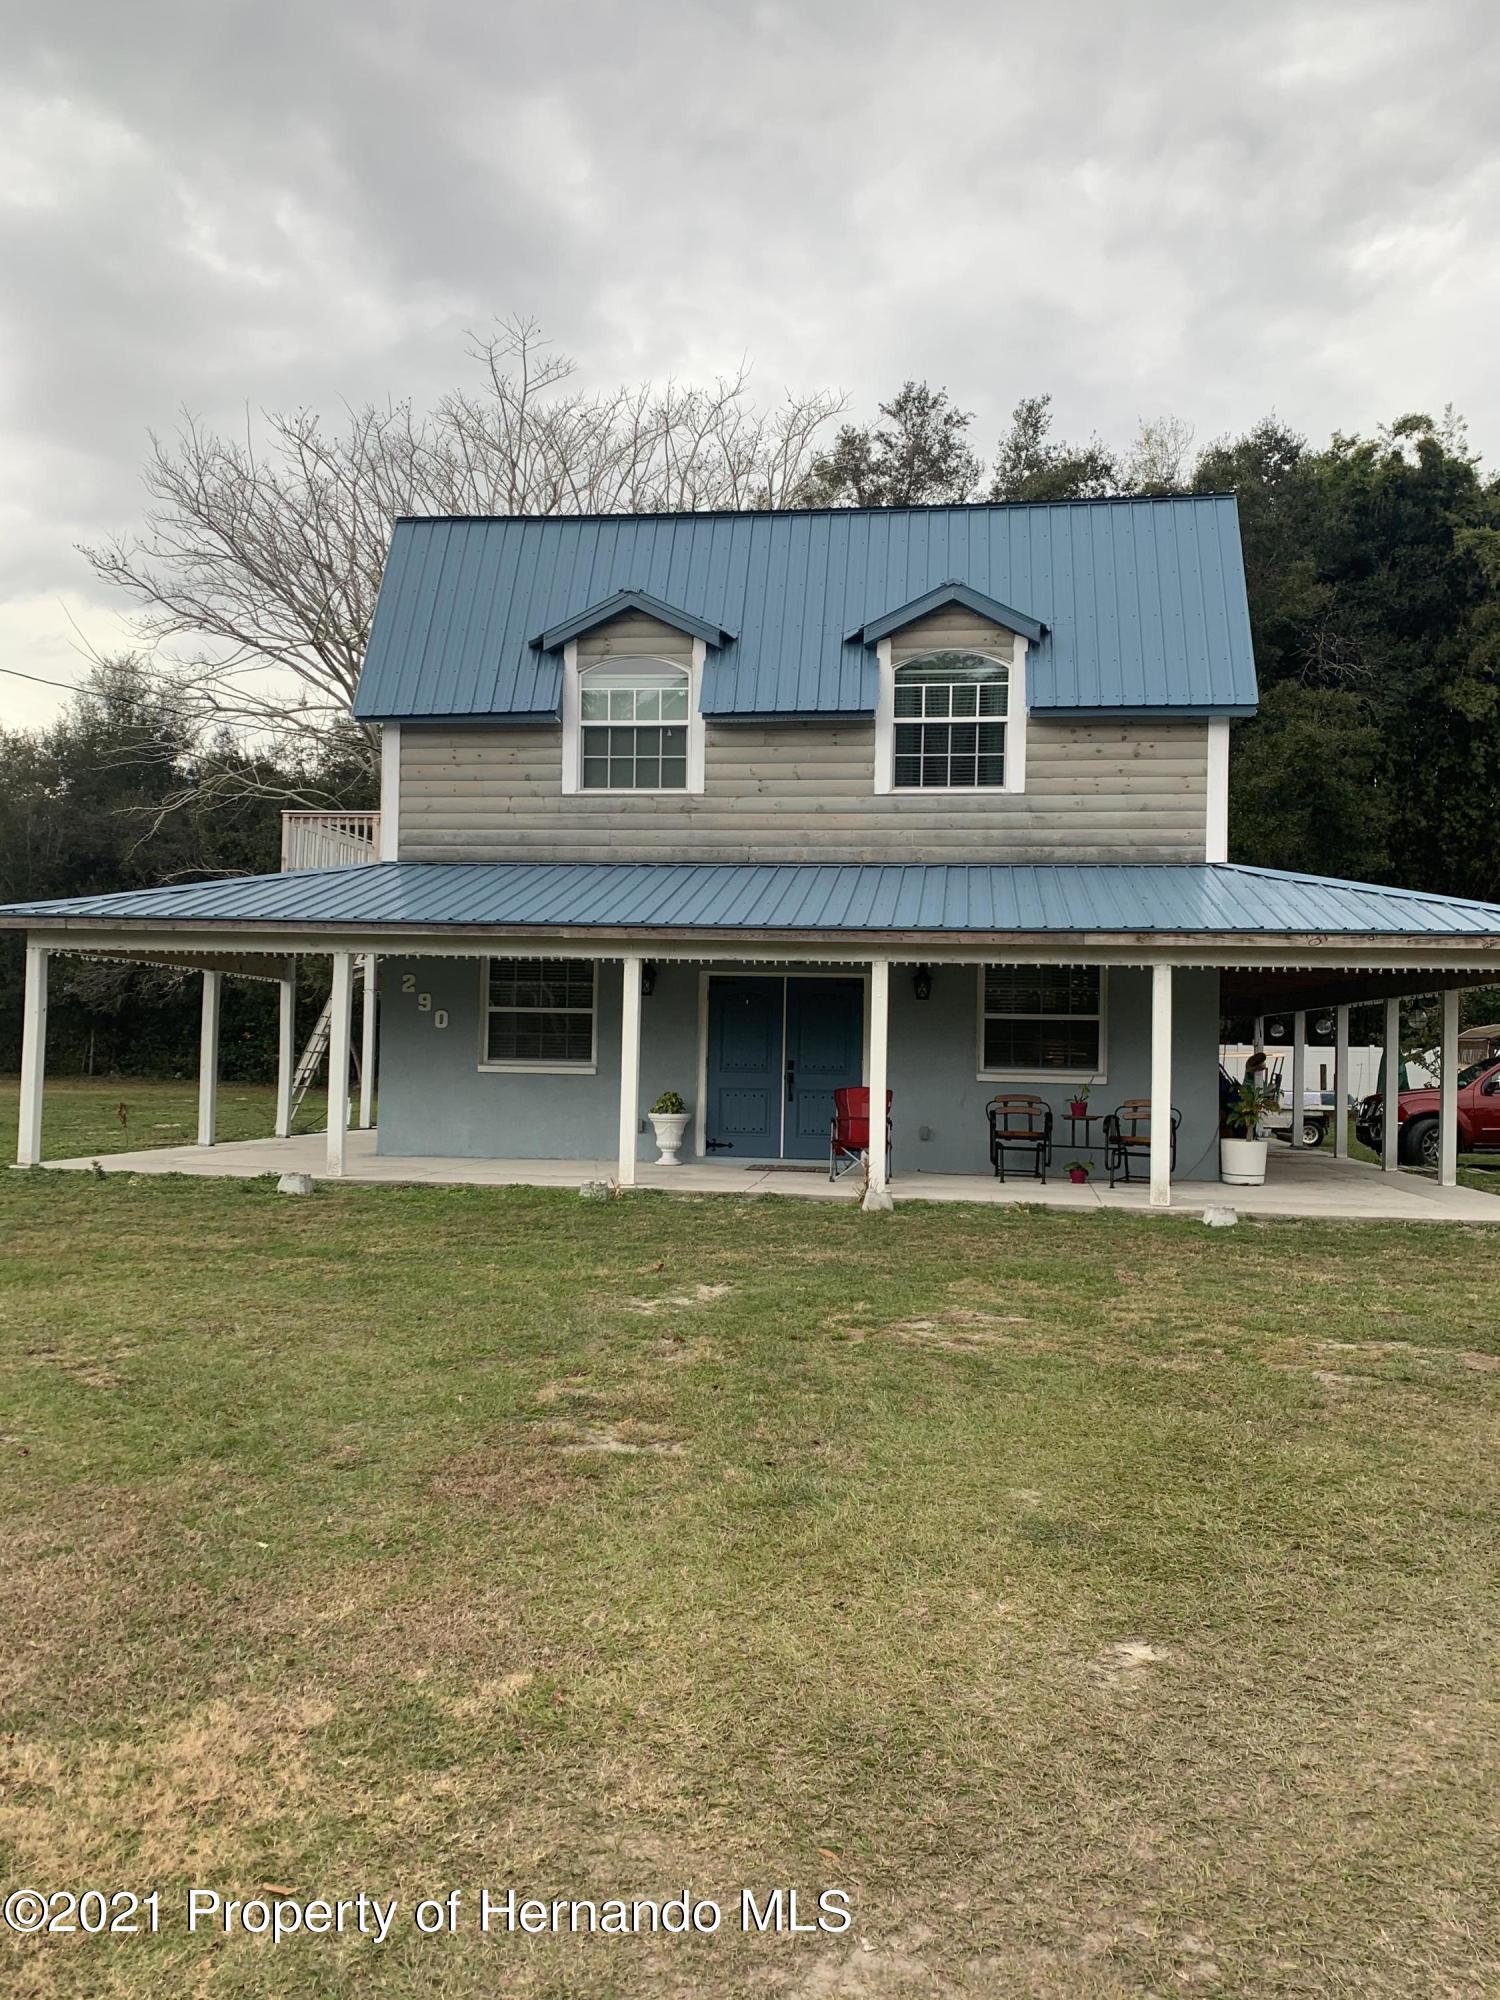 Details for 290 Korbus Road, Brooksville, FL 34604